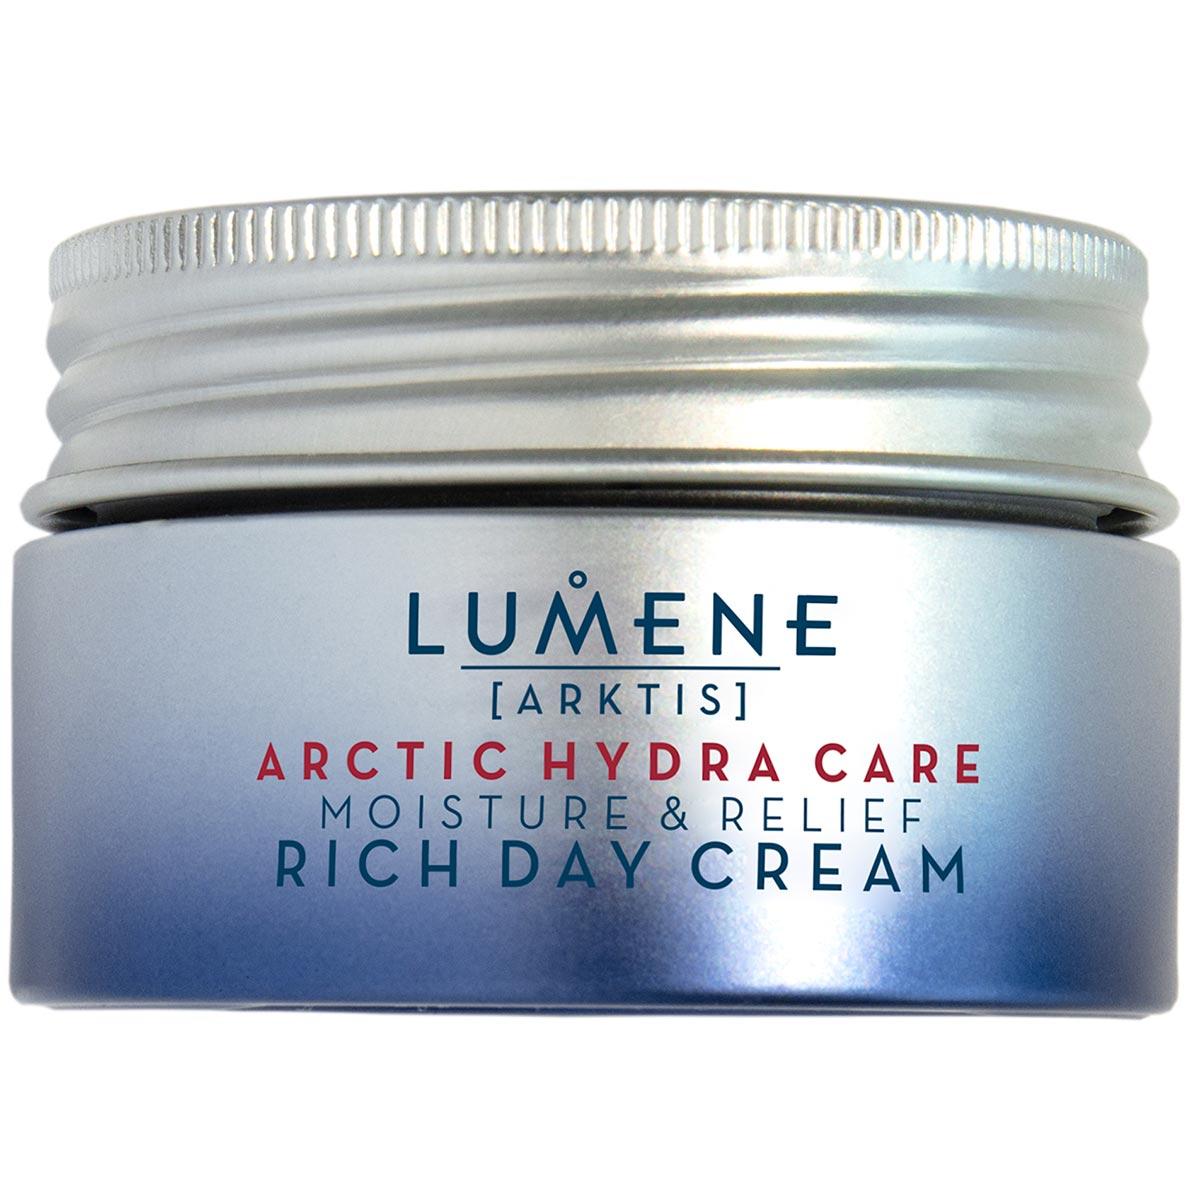 Arctic Hydra Care 50 ml Lumene Dagkräm